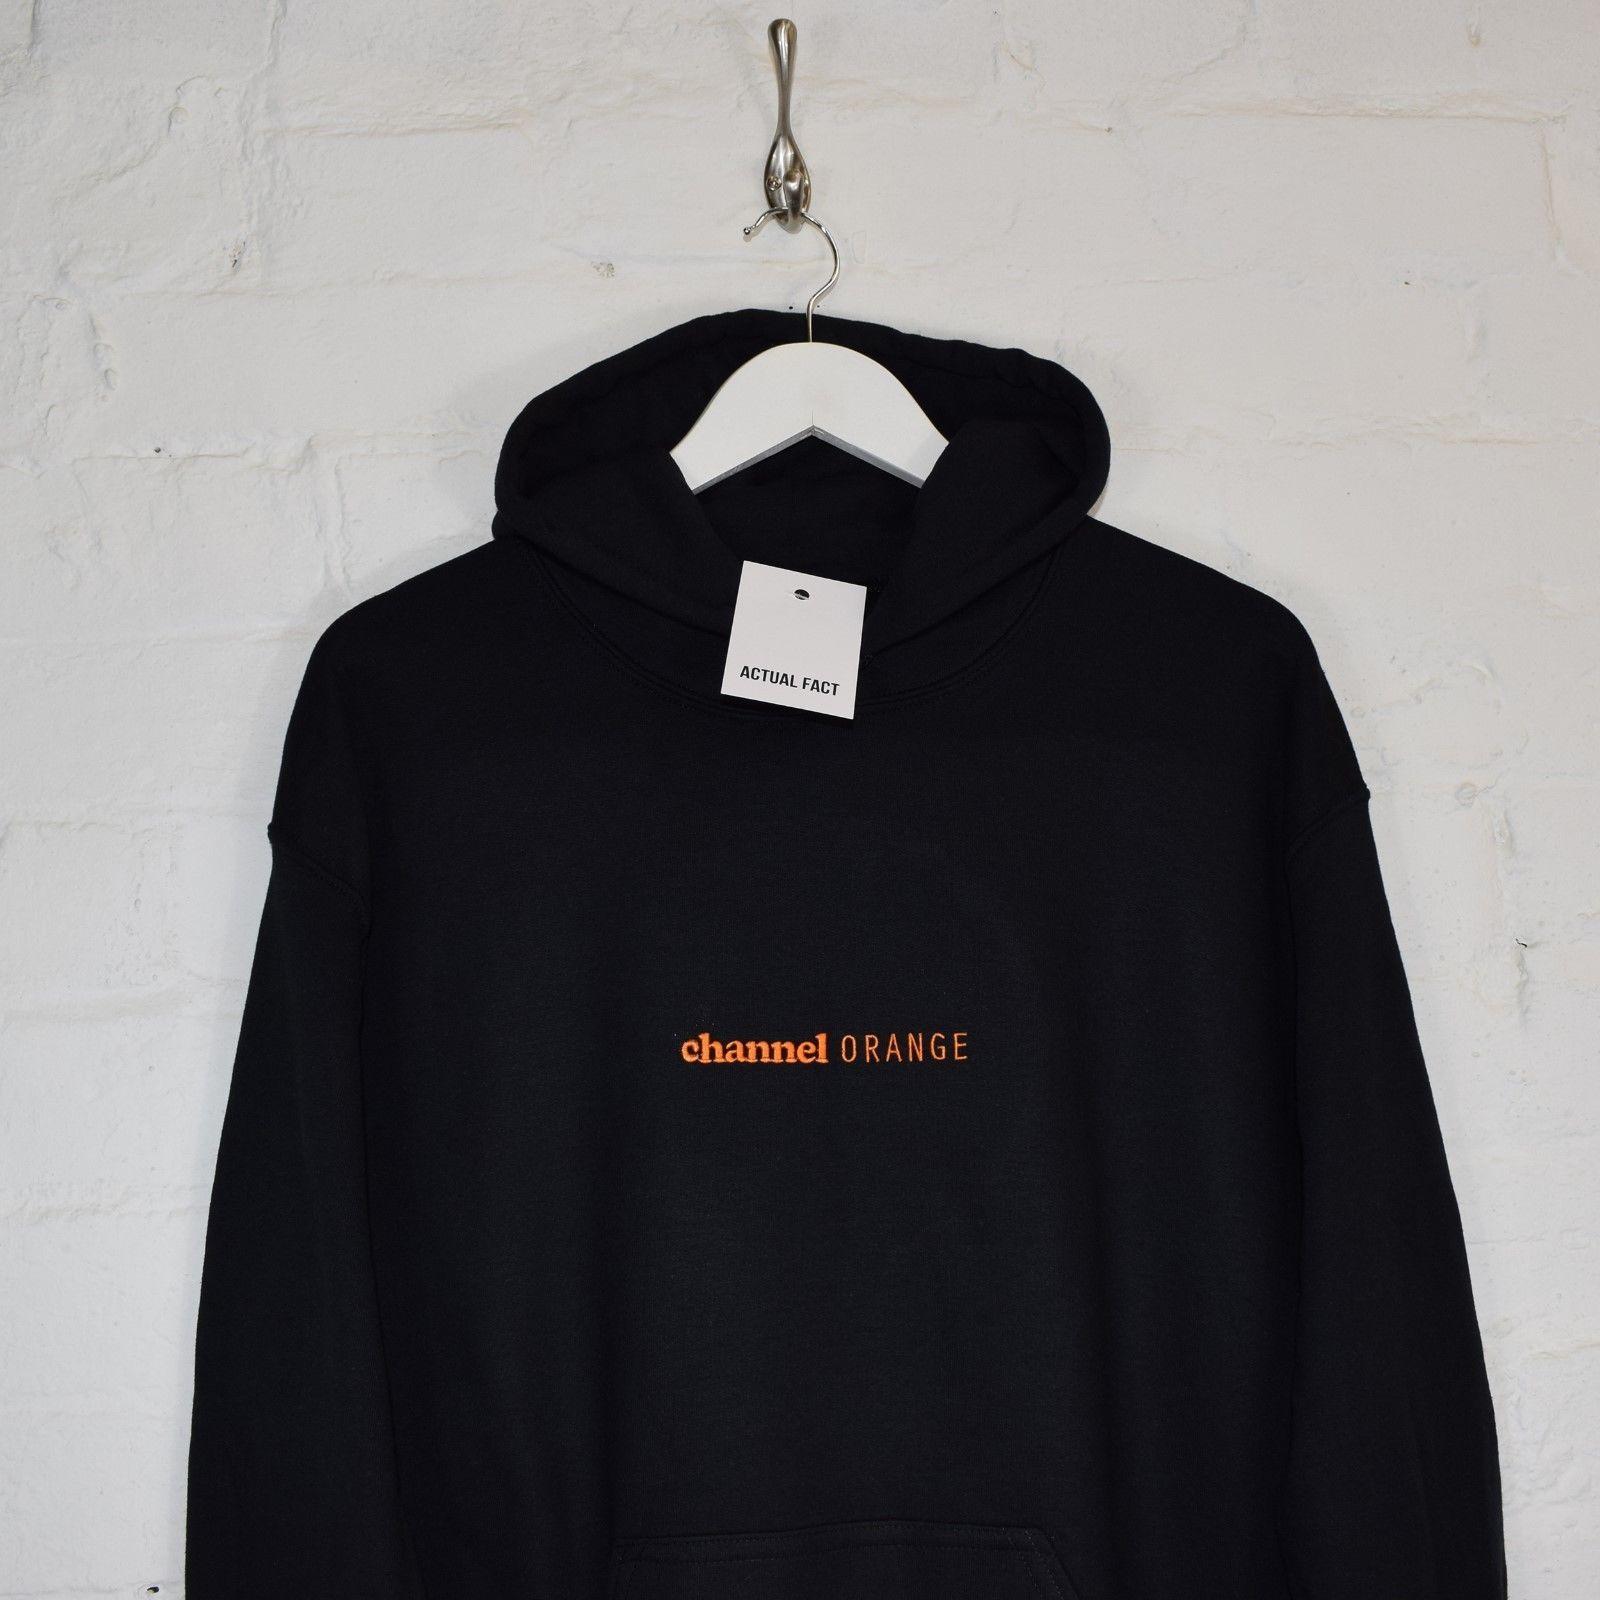 Channel Orange Embroidered Black Hoodie Hooded Top By Af Hoodies Black Hoodie Hoodie Fashion